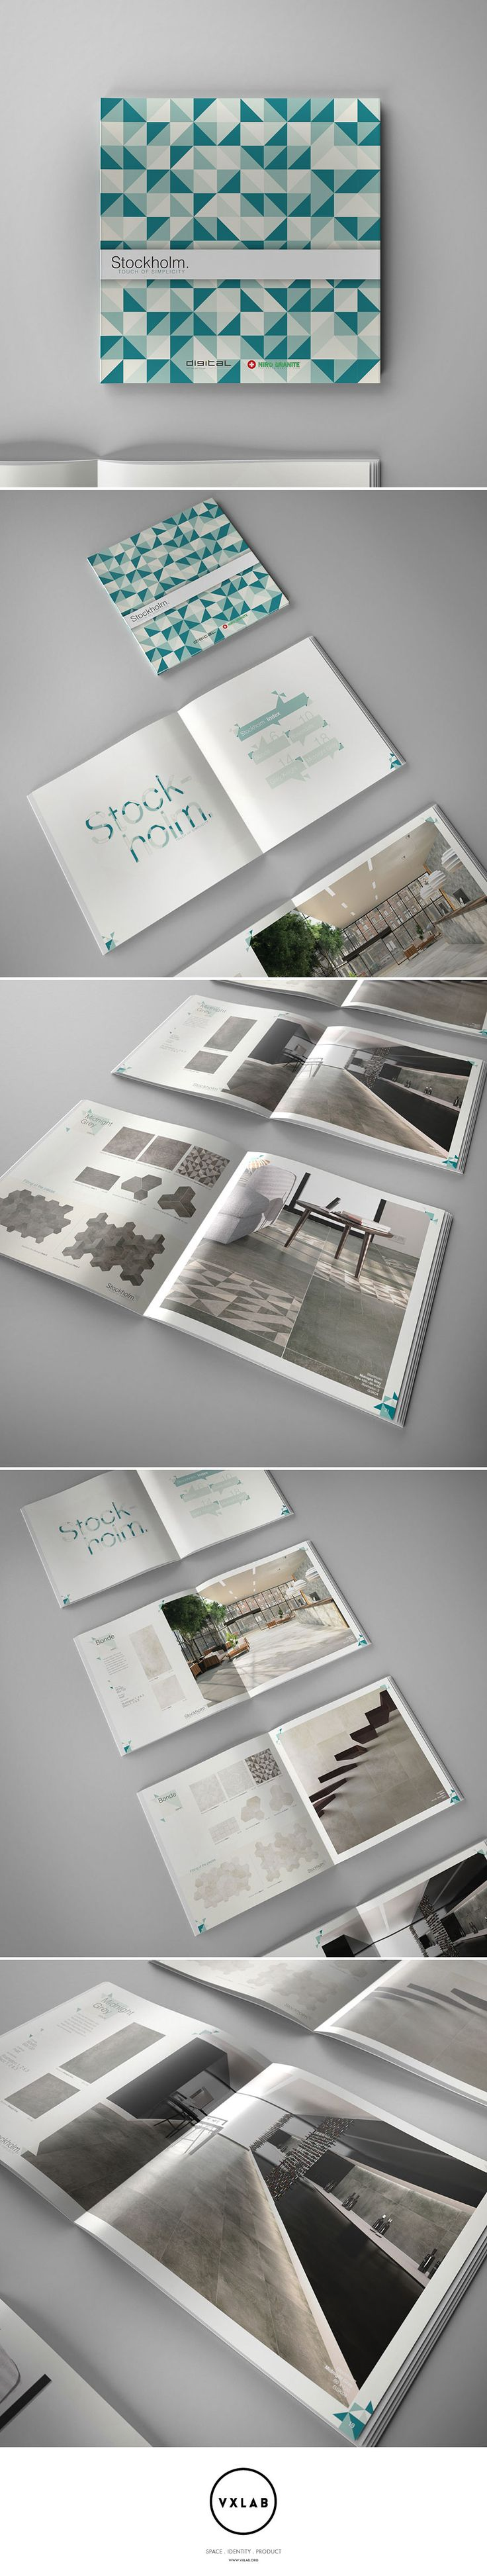 Stockholm Collection Catalogue for Niro Granite. Design by VXLAB Branding & Design Direction www.vxlab.org